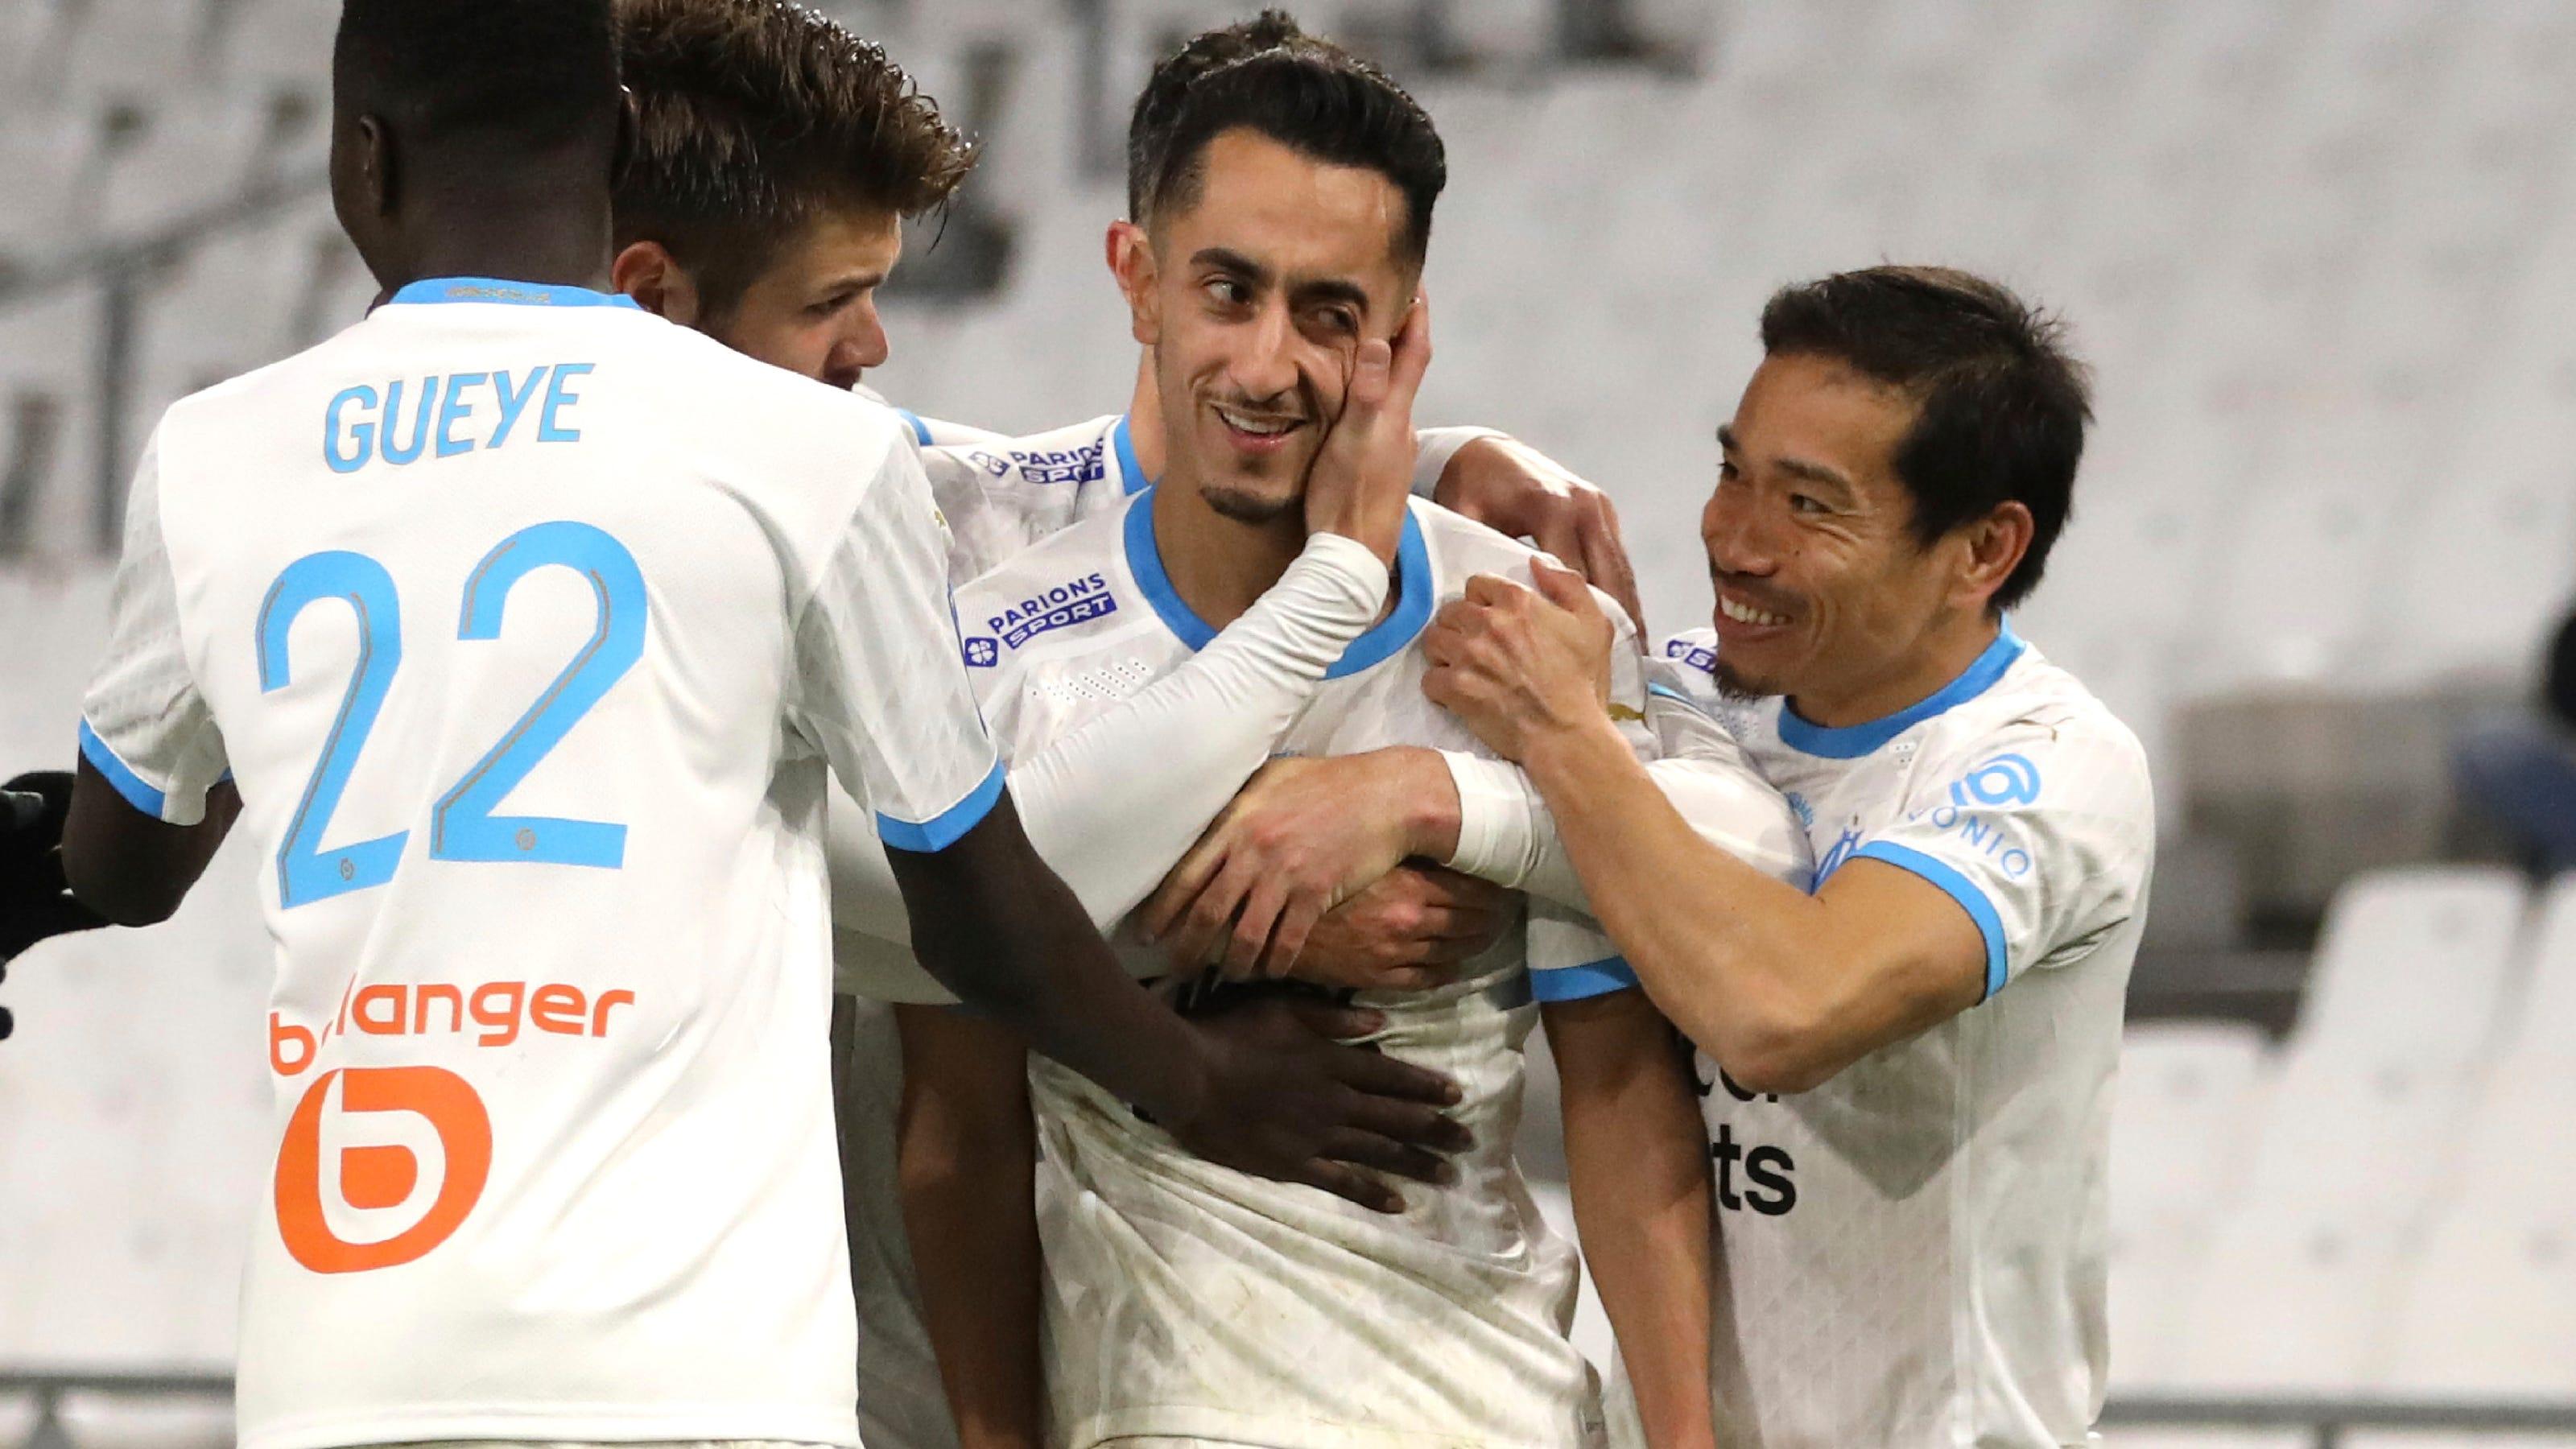 Marseille seeks league downsizing amid French soccer turmoil